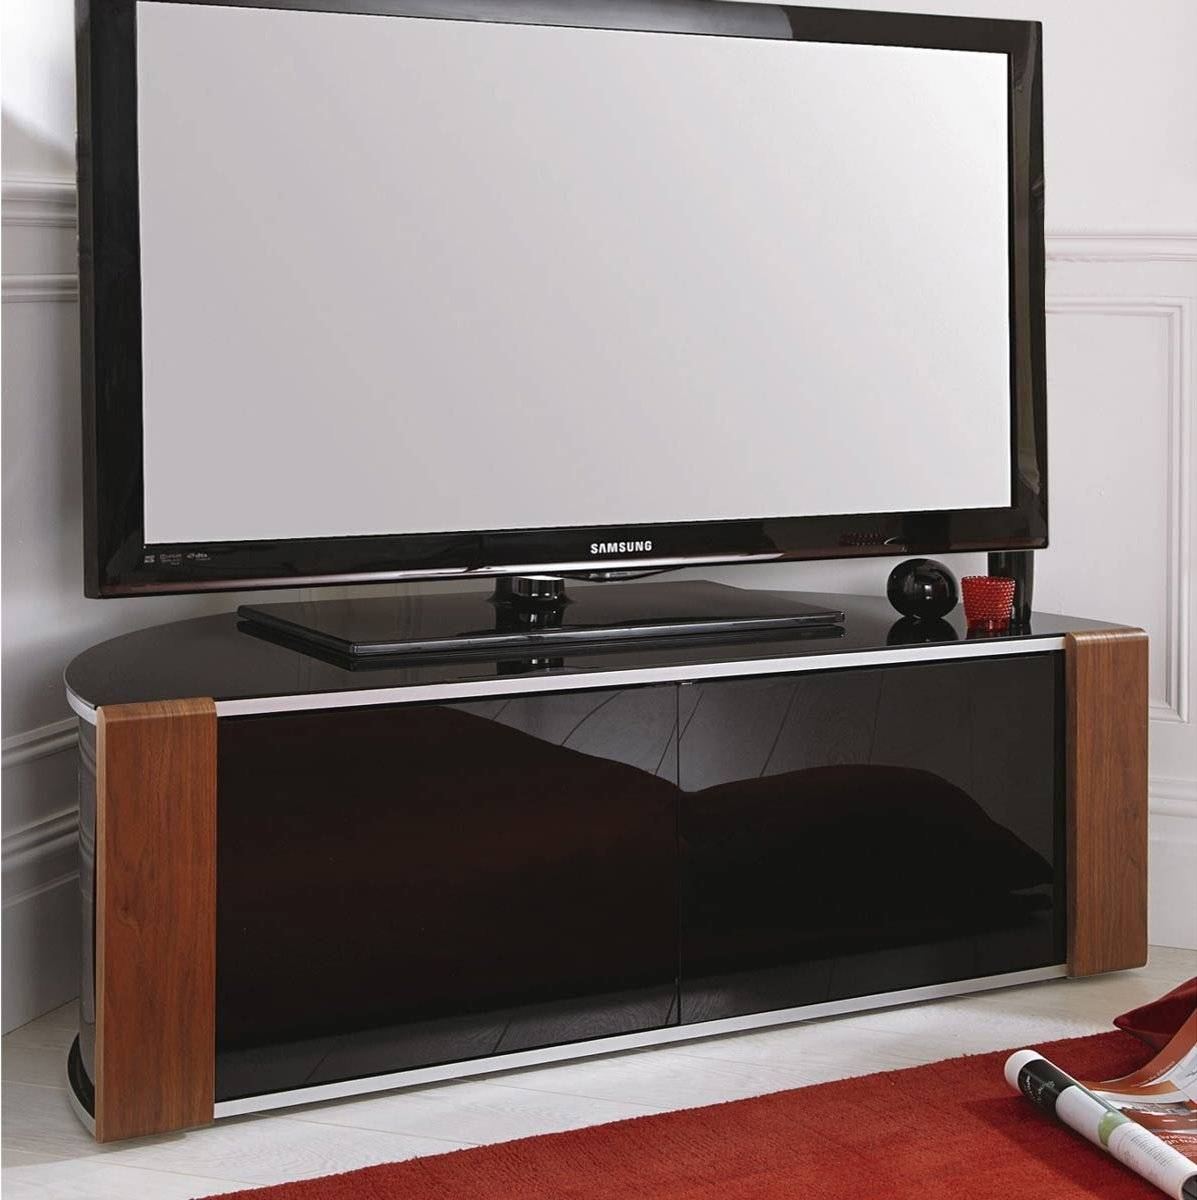 Best 15 of Black Corner Tv Cabinets With Glass Doors